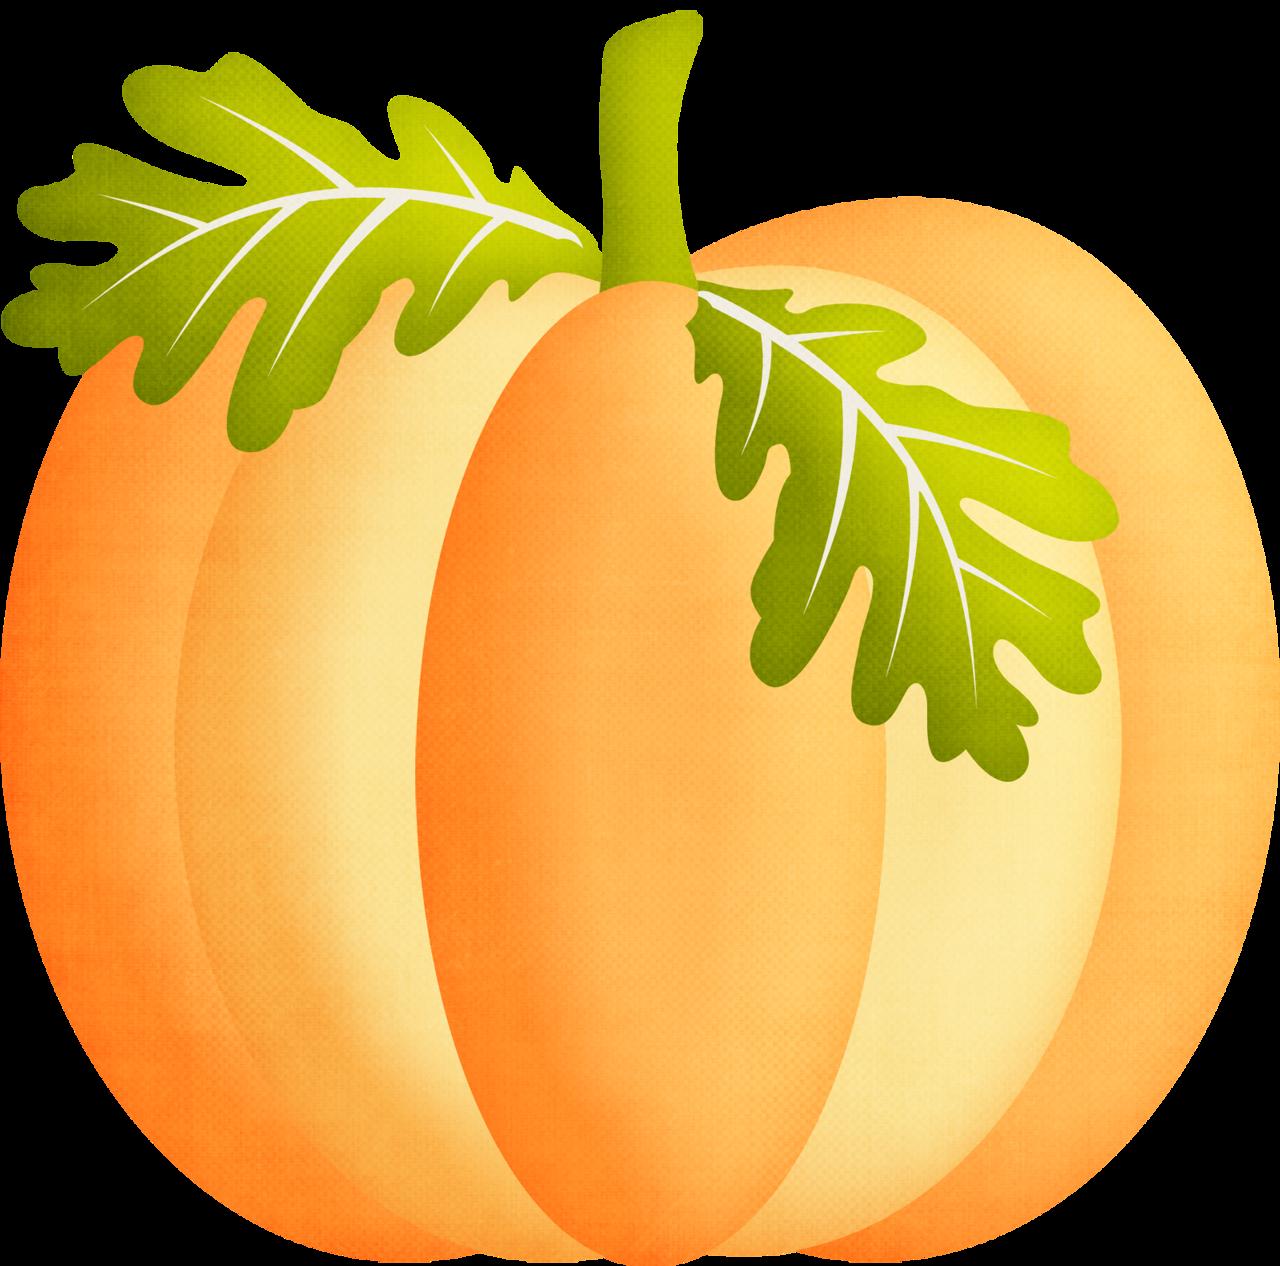 Free to use thanksgiving psp clipart svg Alena1984 — «pbp_chouk_OM_elemen01.png» на Яндекс.Фотках | Fall Clip ... svg